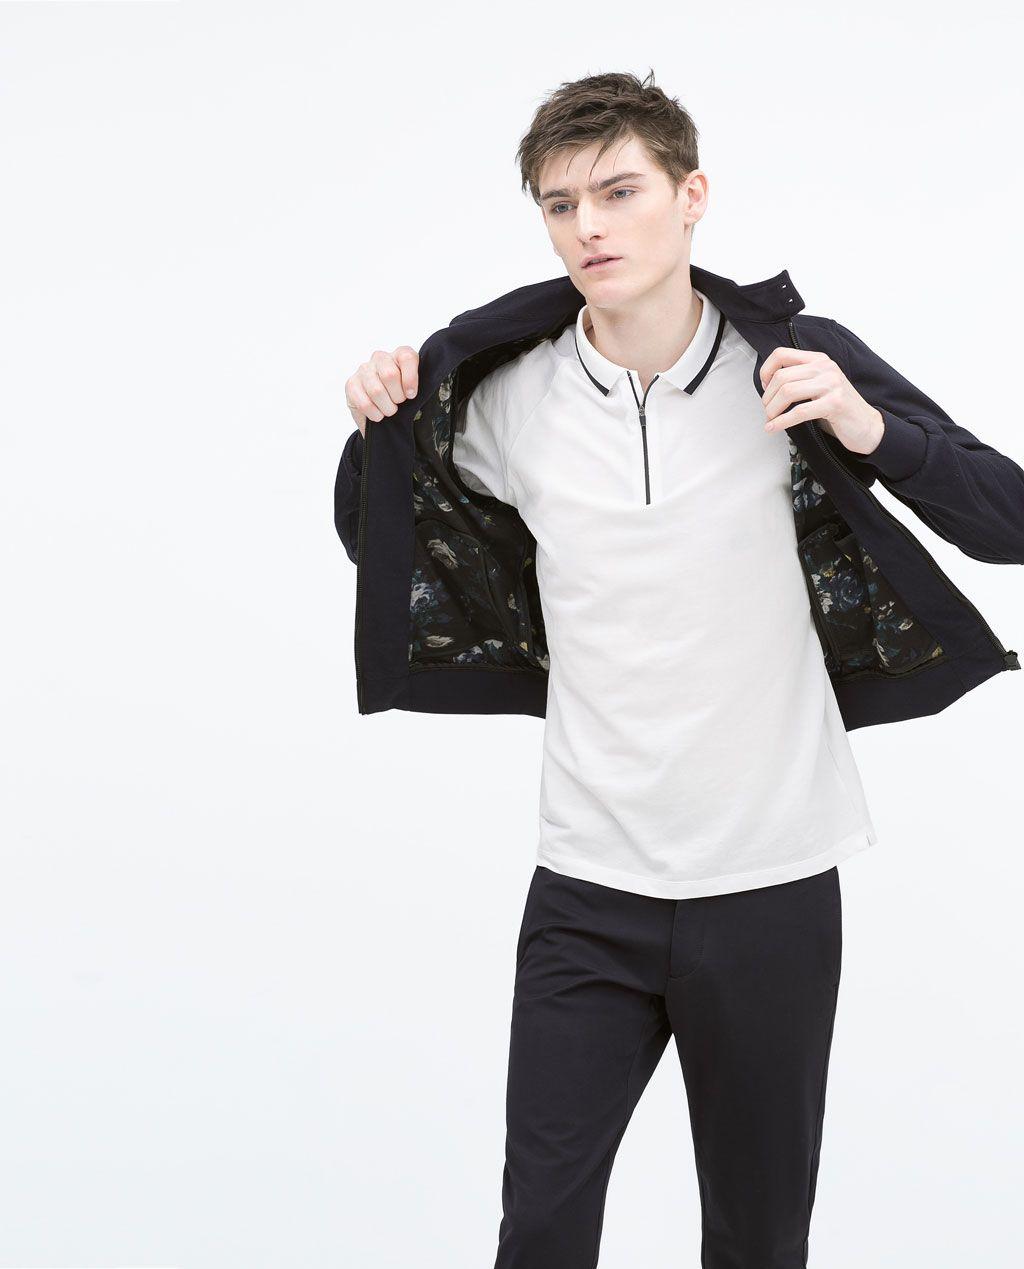 ZARA - PROMOCIJA - Knit jacket floral lining